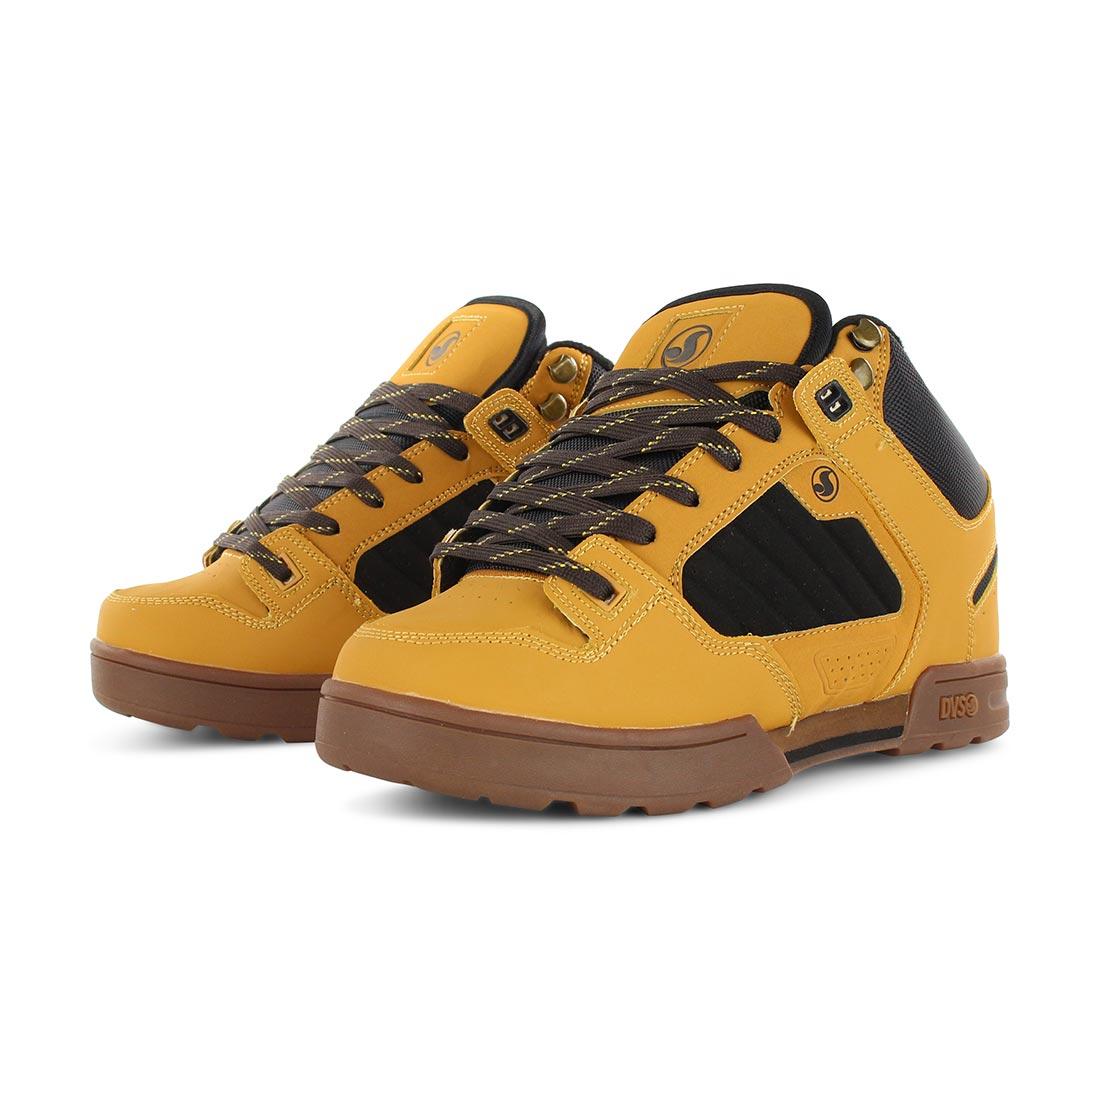 89bec122600 DVS Shoes Militia Boot - Tan Chamois Leather